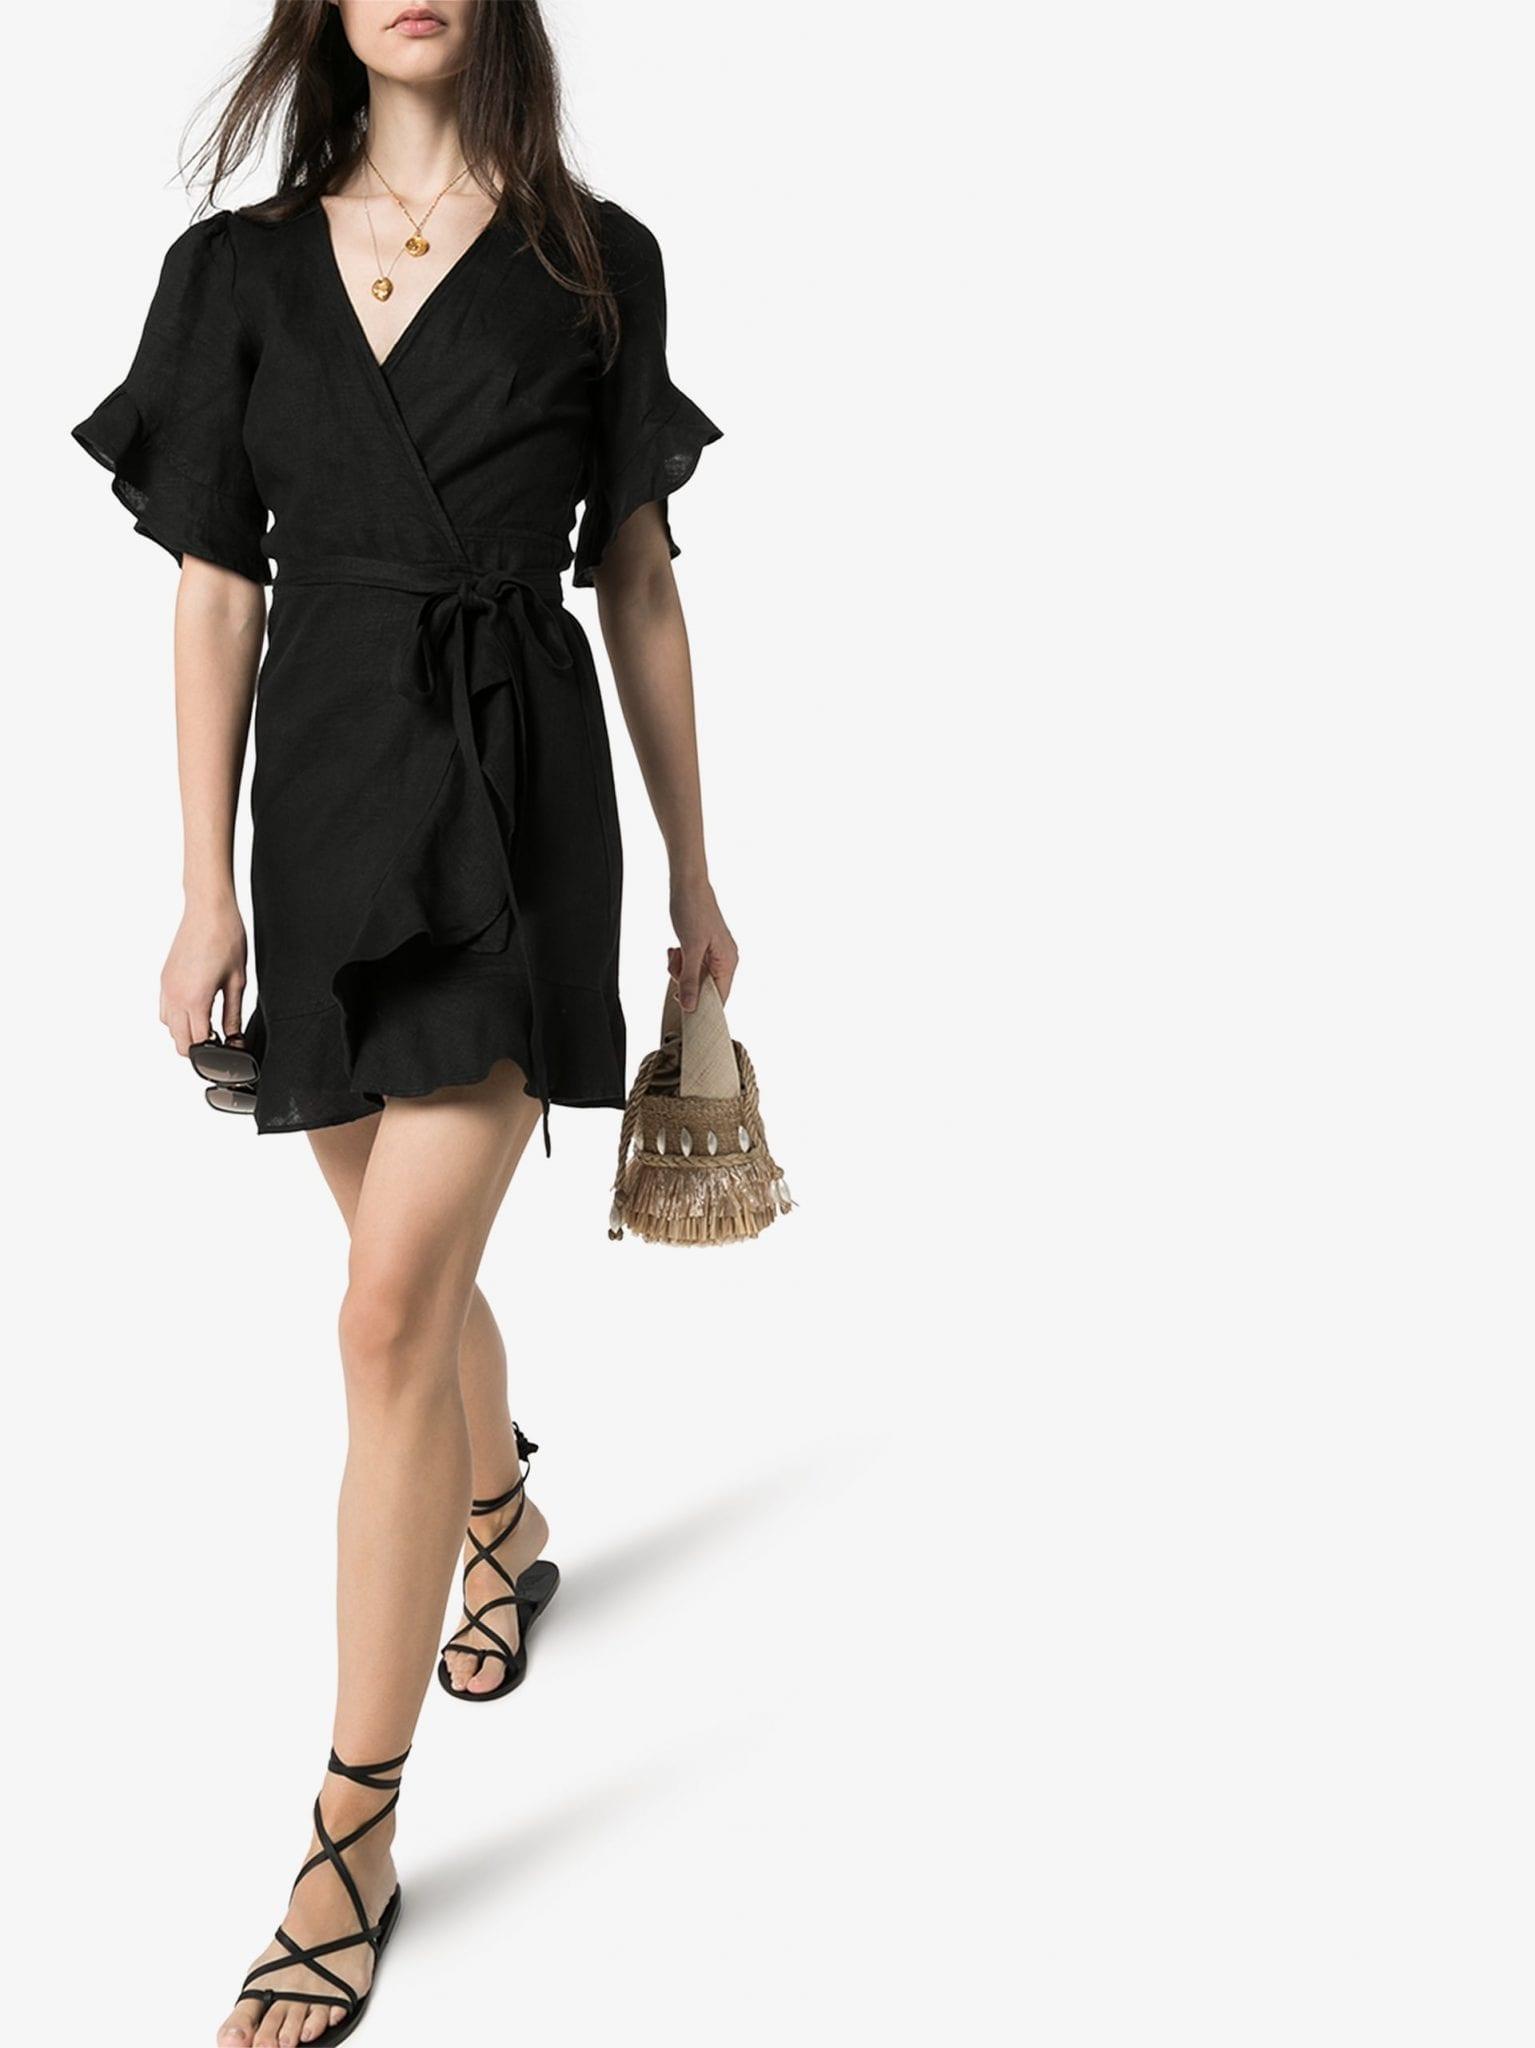 HONORINE Edie Wrap Front Mini Dress